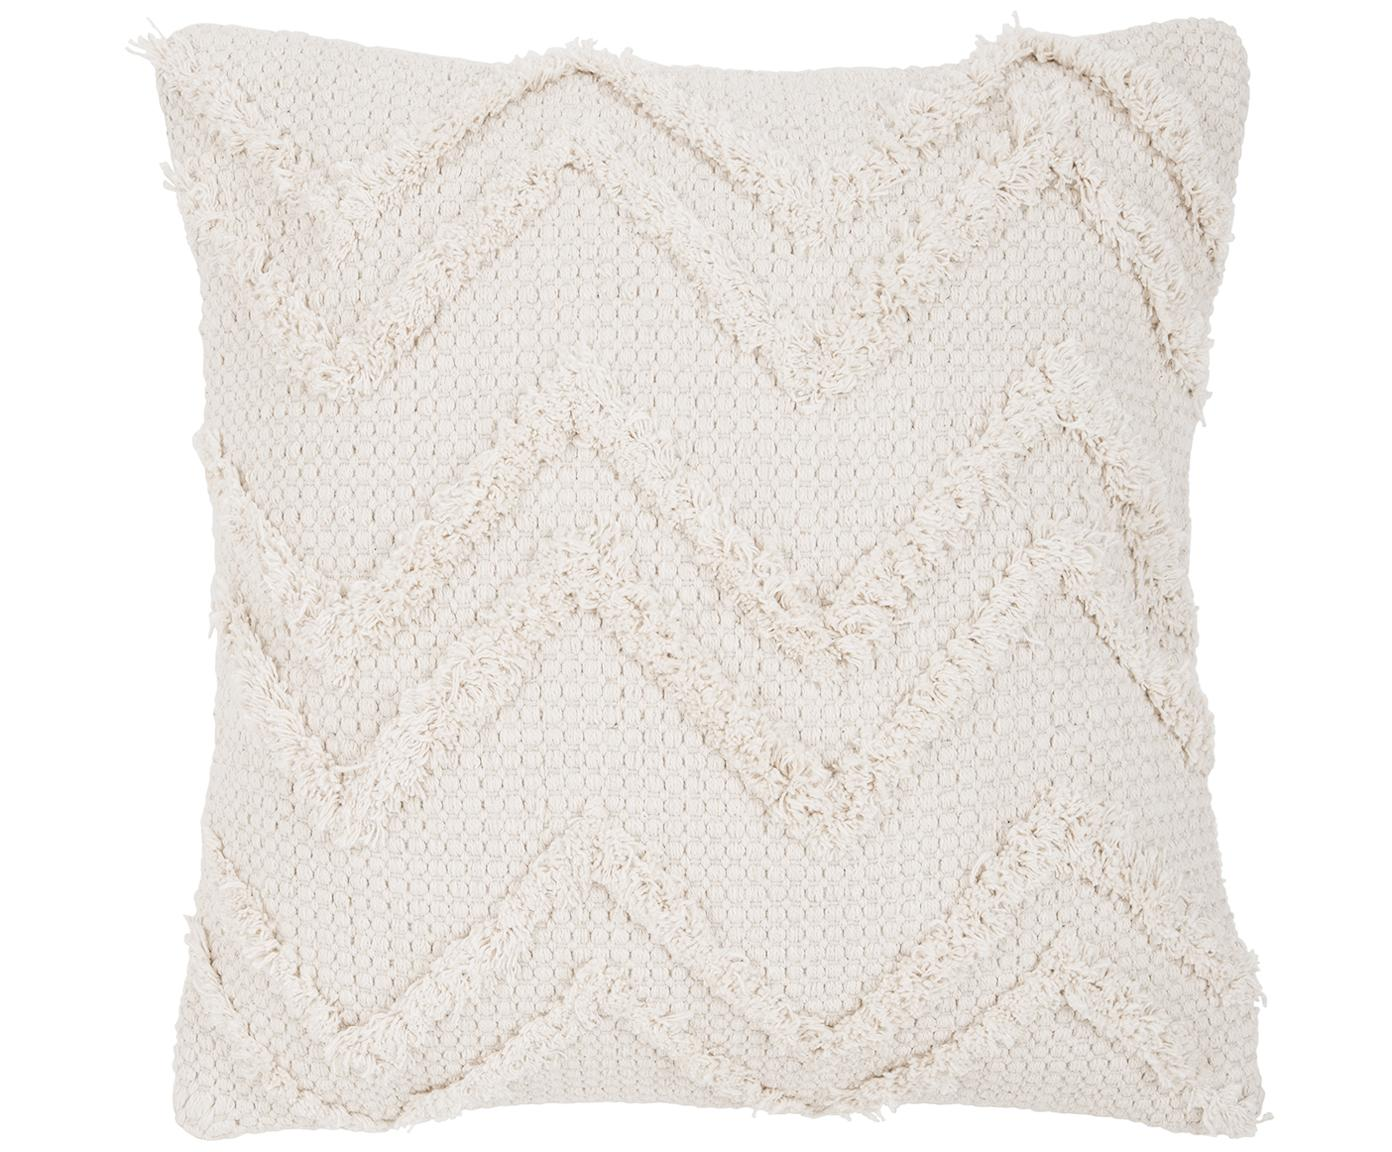 Kissenhülle Akesha mit Zickzack-Muster, 100% Baumwolle, Ecru, 45 x 45 cm